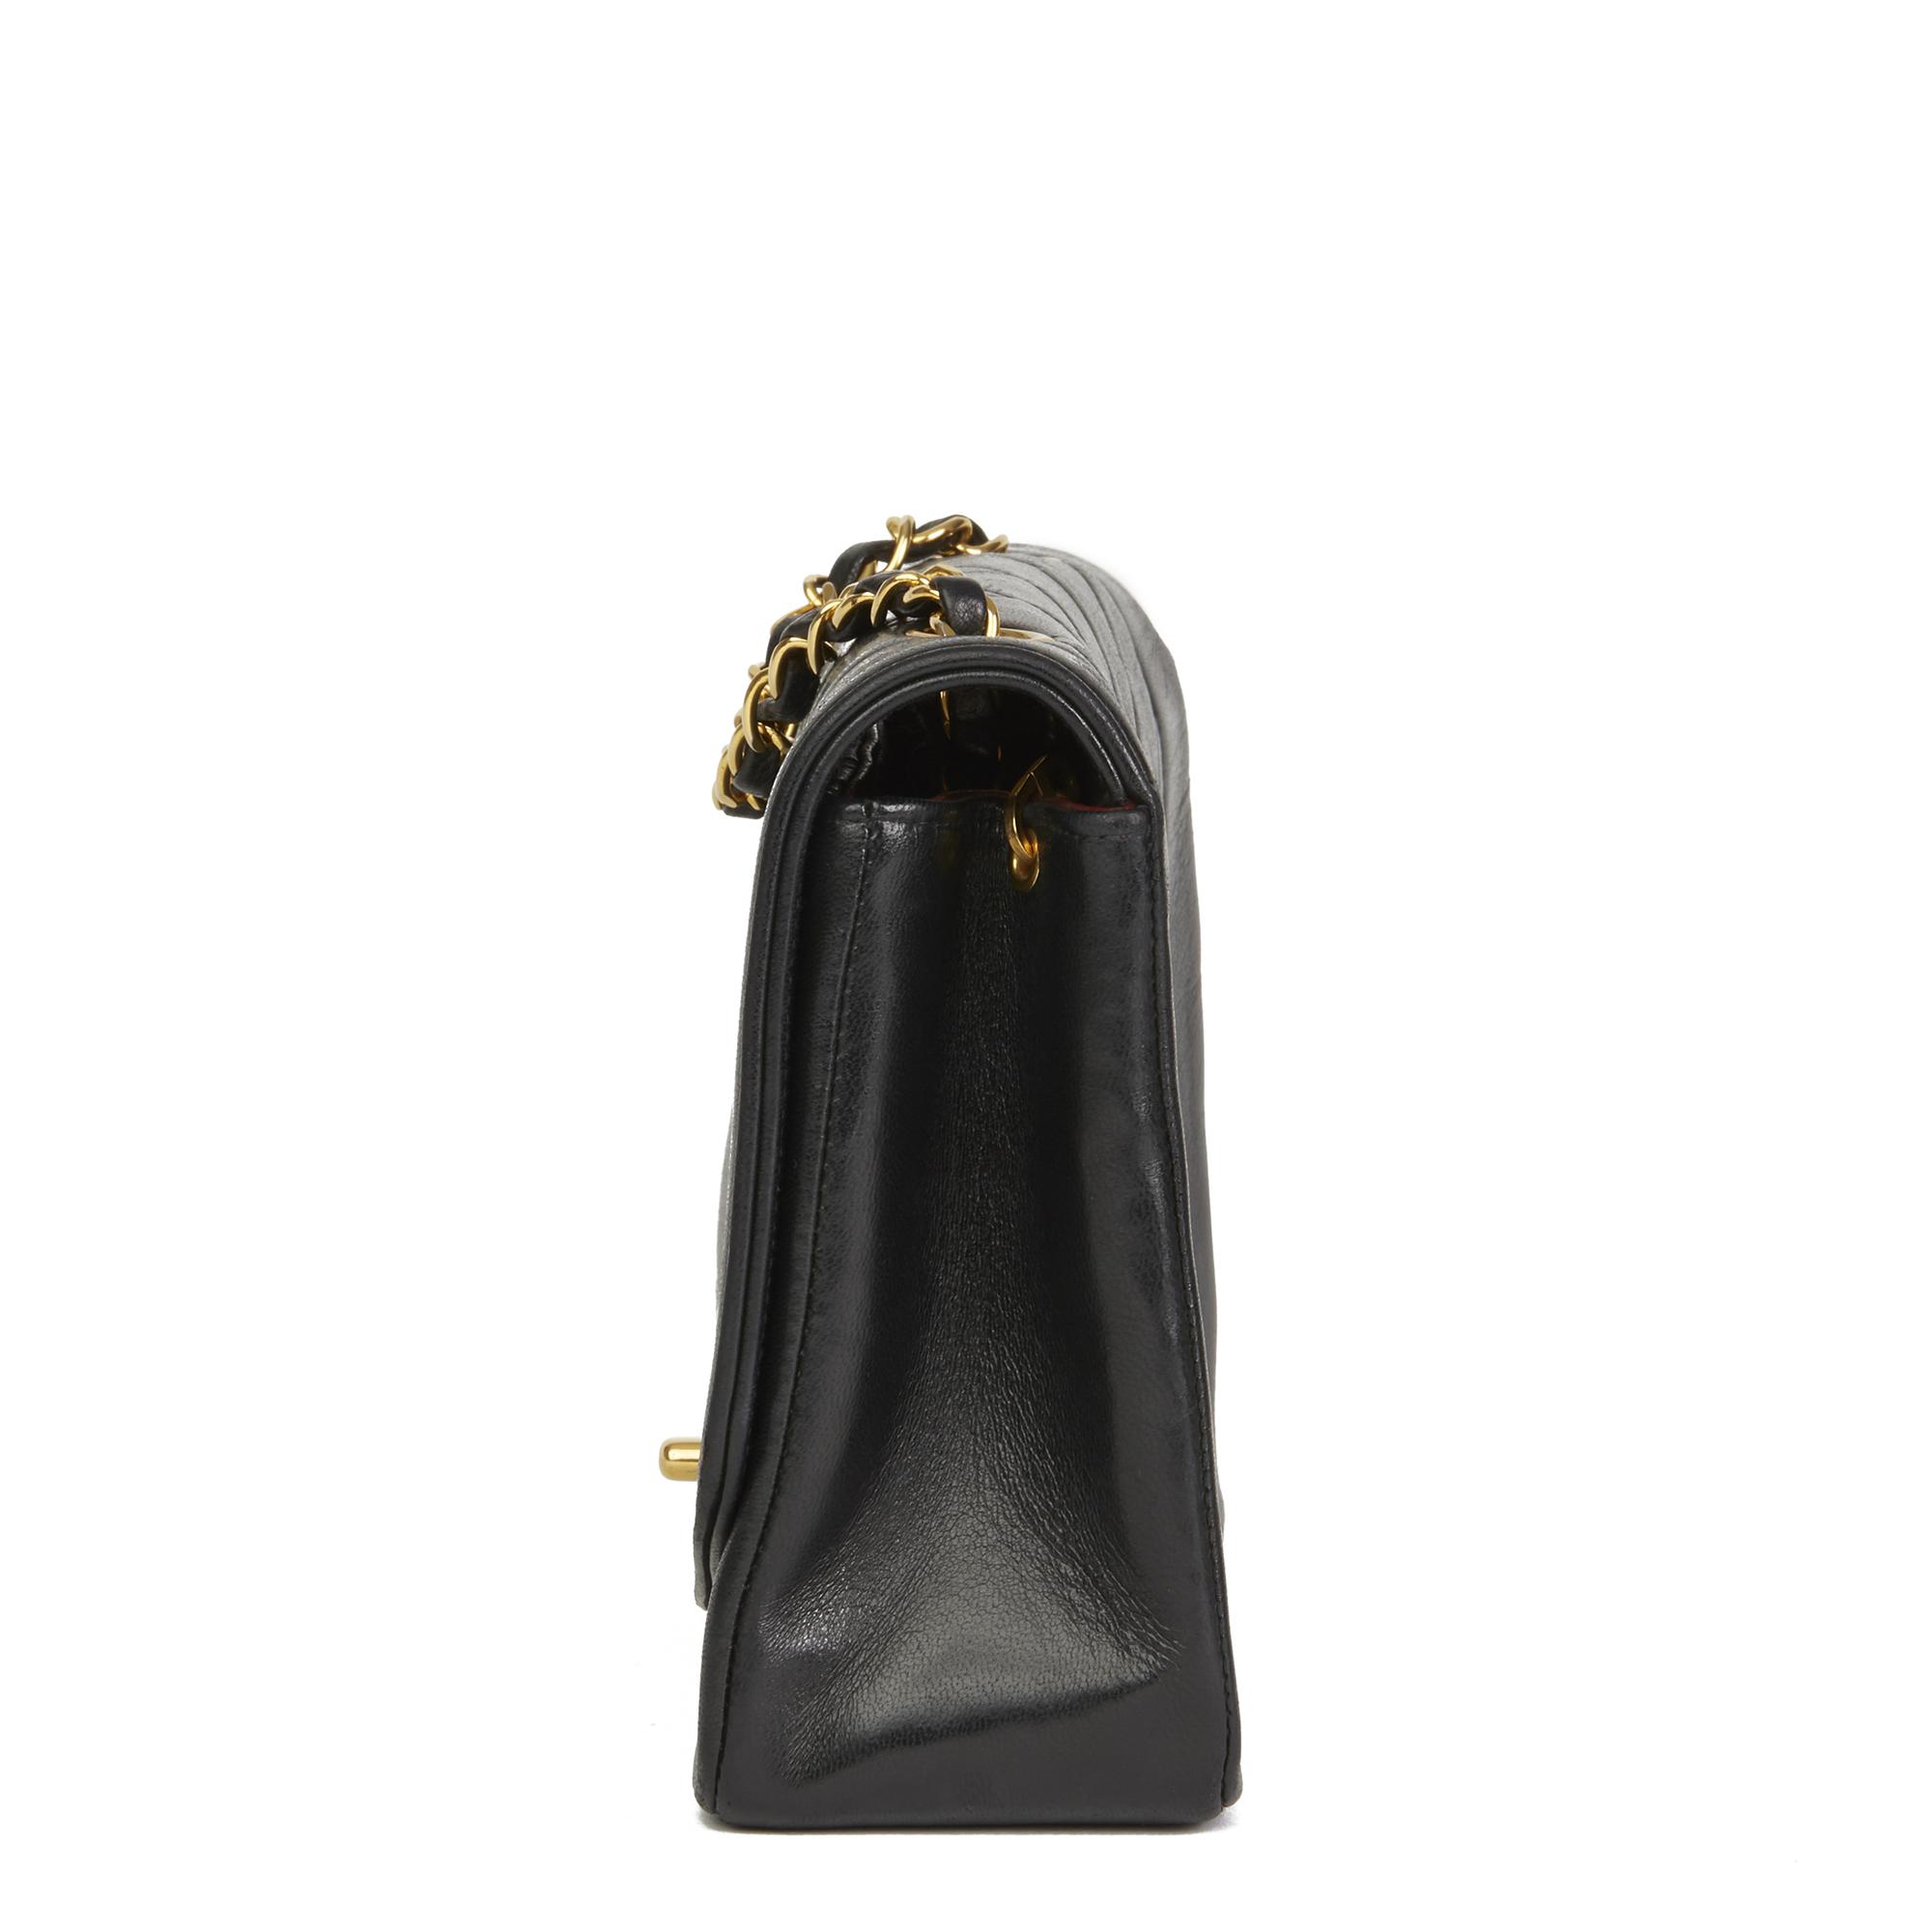 0814b8d9180277 Chanel Black Quilted Lambskin Vintage Medium Diana Classic Single Flap Bag